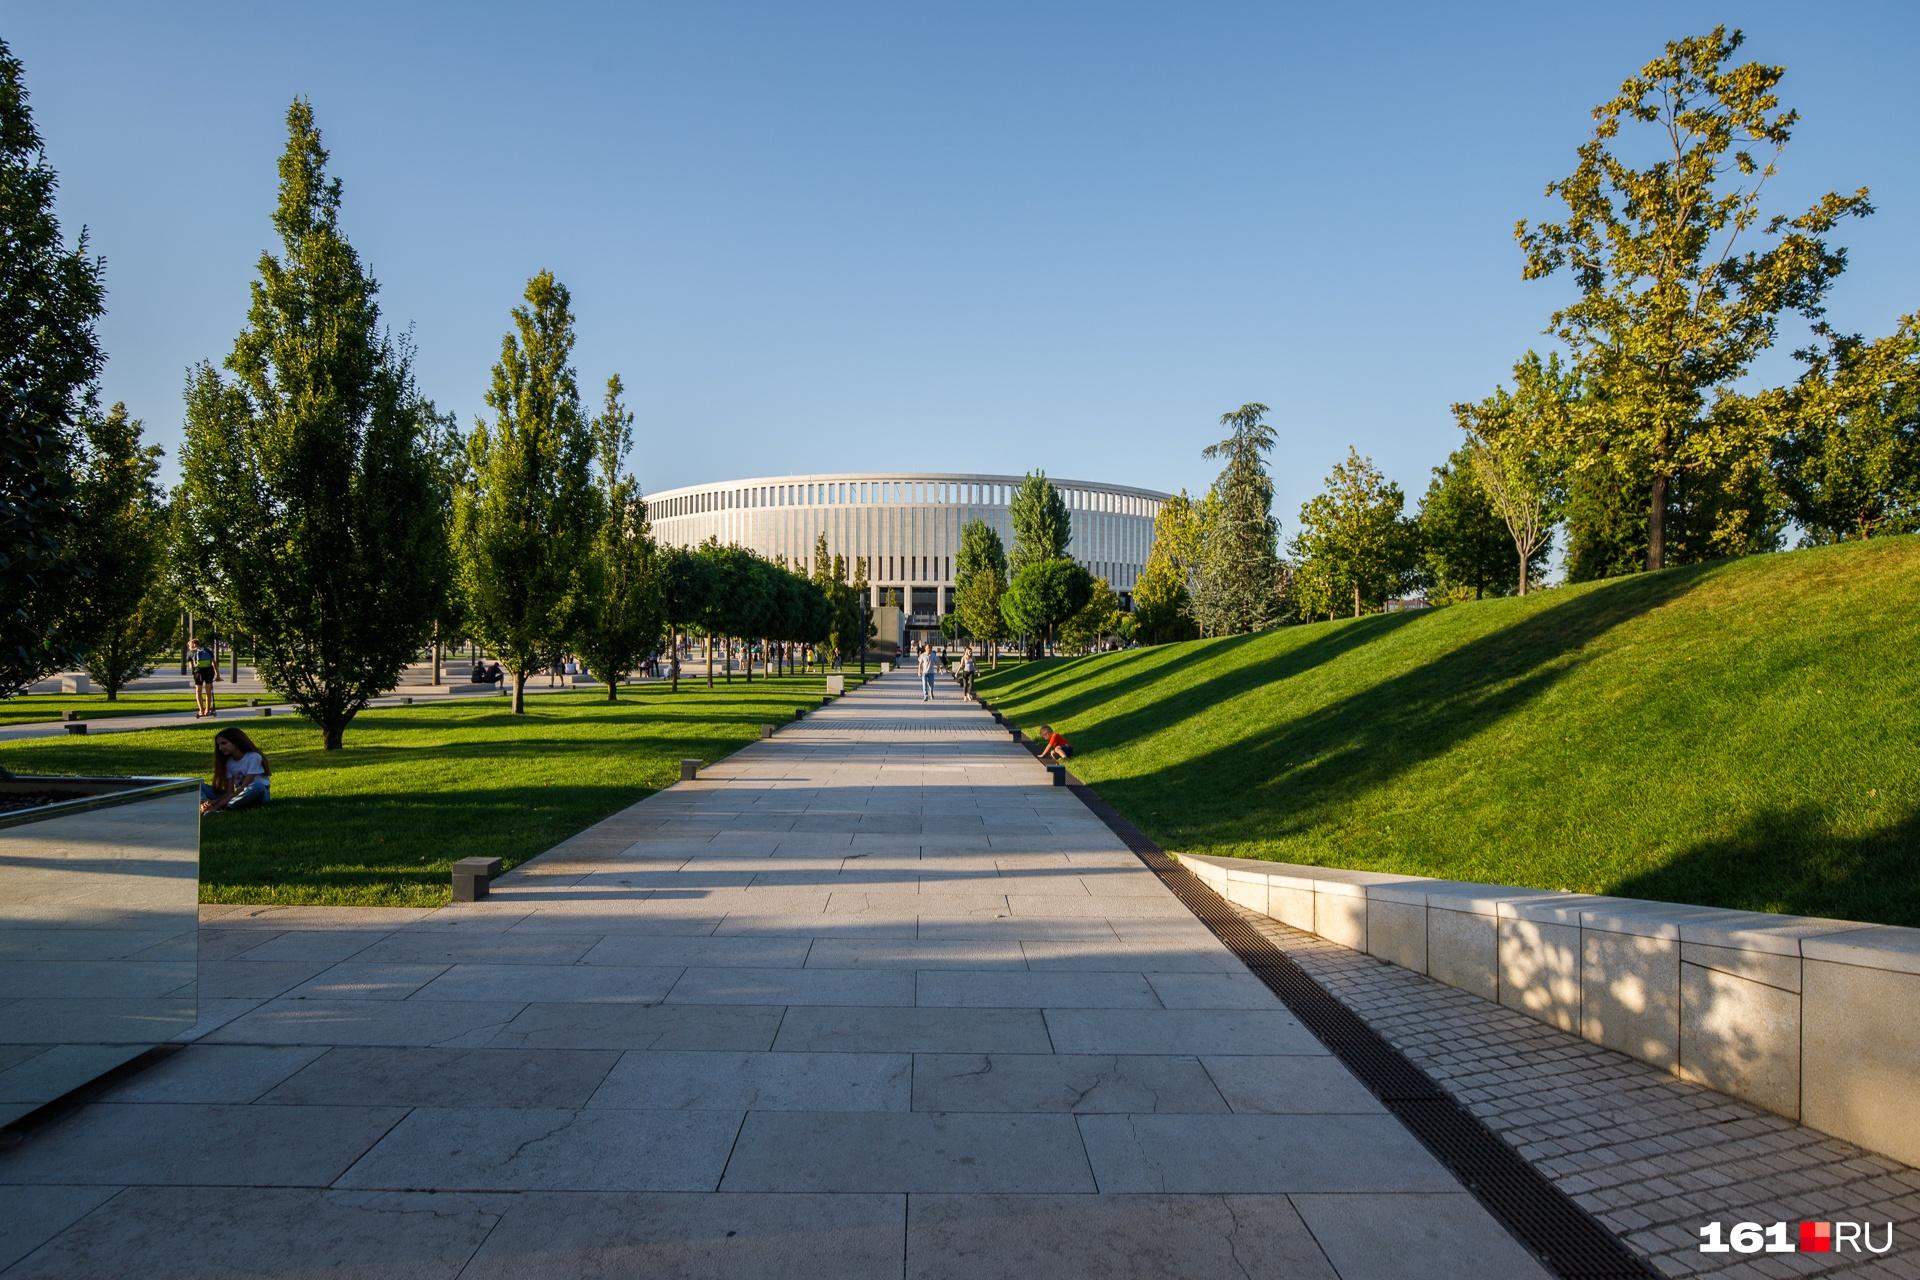 "Парк разбит рядом со стадионом «Краснодар». По данным <a href=""https://www.forbes.ru/milliardery/354809-novyy-dar-dlya-krasnodara-sergey-galickiy-filantrop-goda-po-versii-forbes"" target=""_blank"" class=""_"">Forbes</a>, он обошелся Сергею Галицкому в 4 миллиарда рублей<br><br><br><br>"